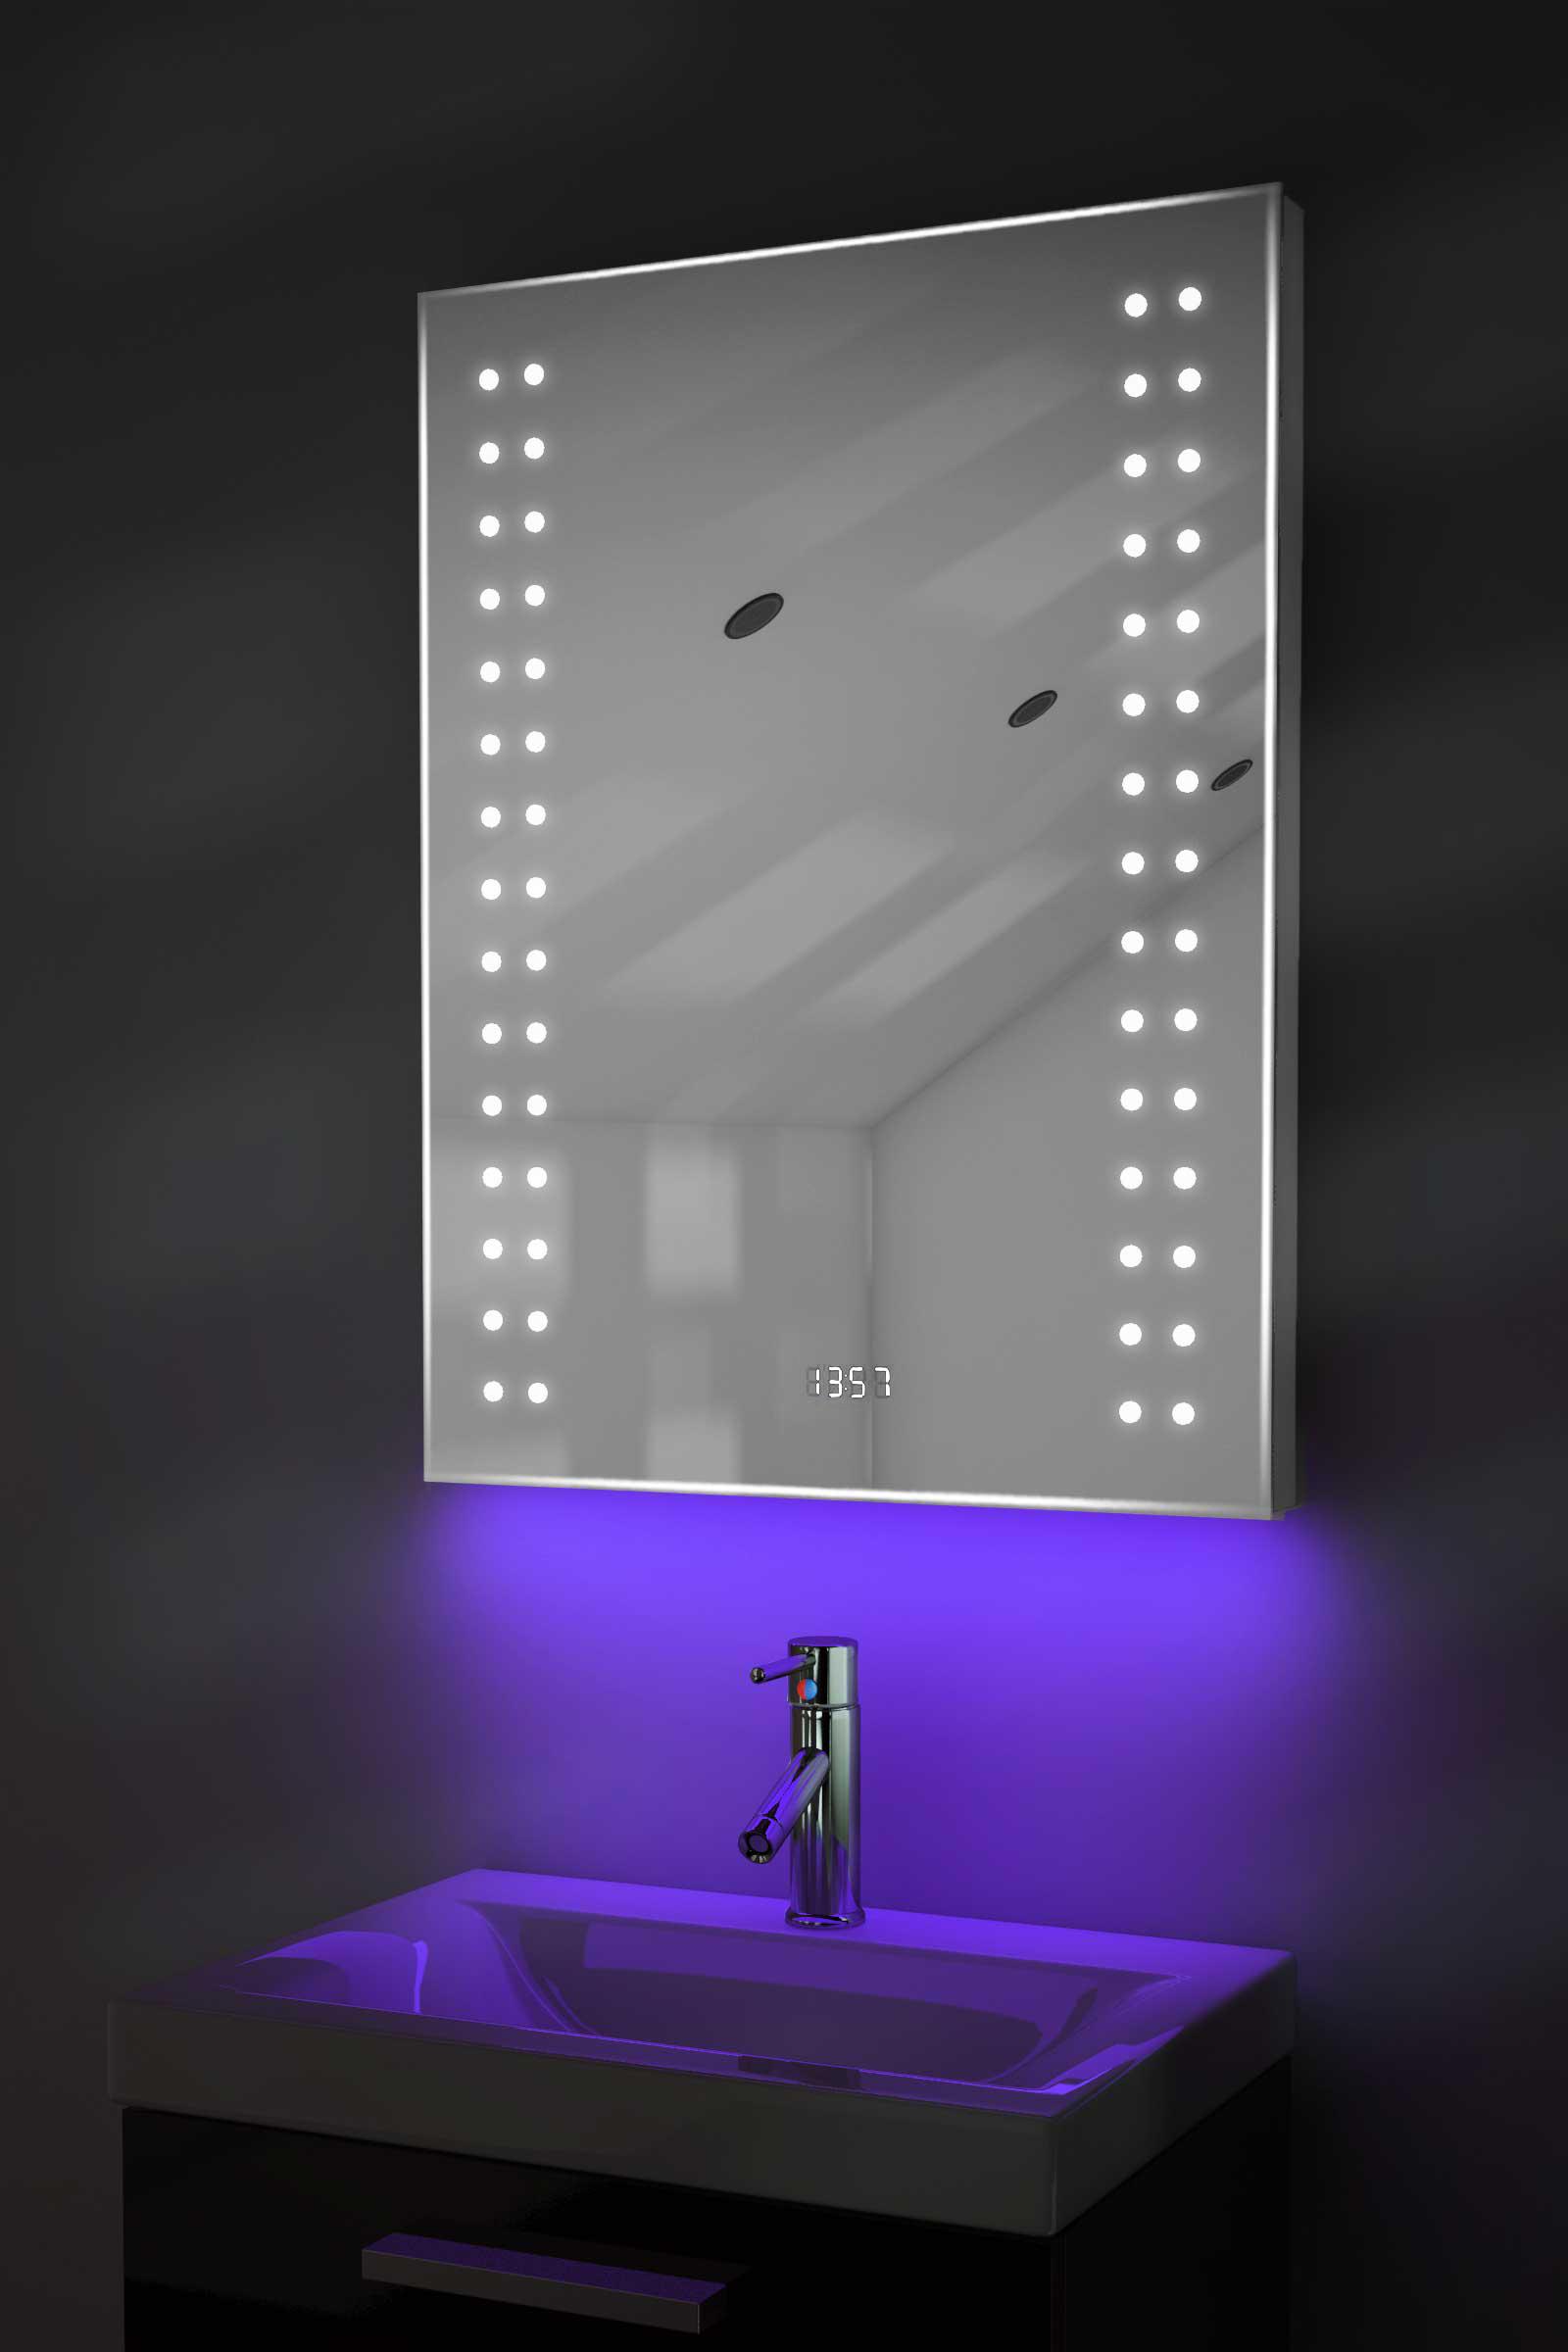 Digital Clock Shaver Bathroom Mirror With Under Lighting Demist Sensor K187u